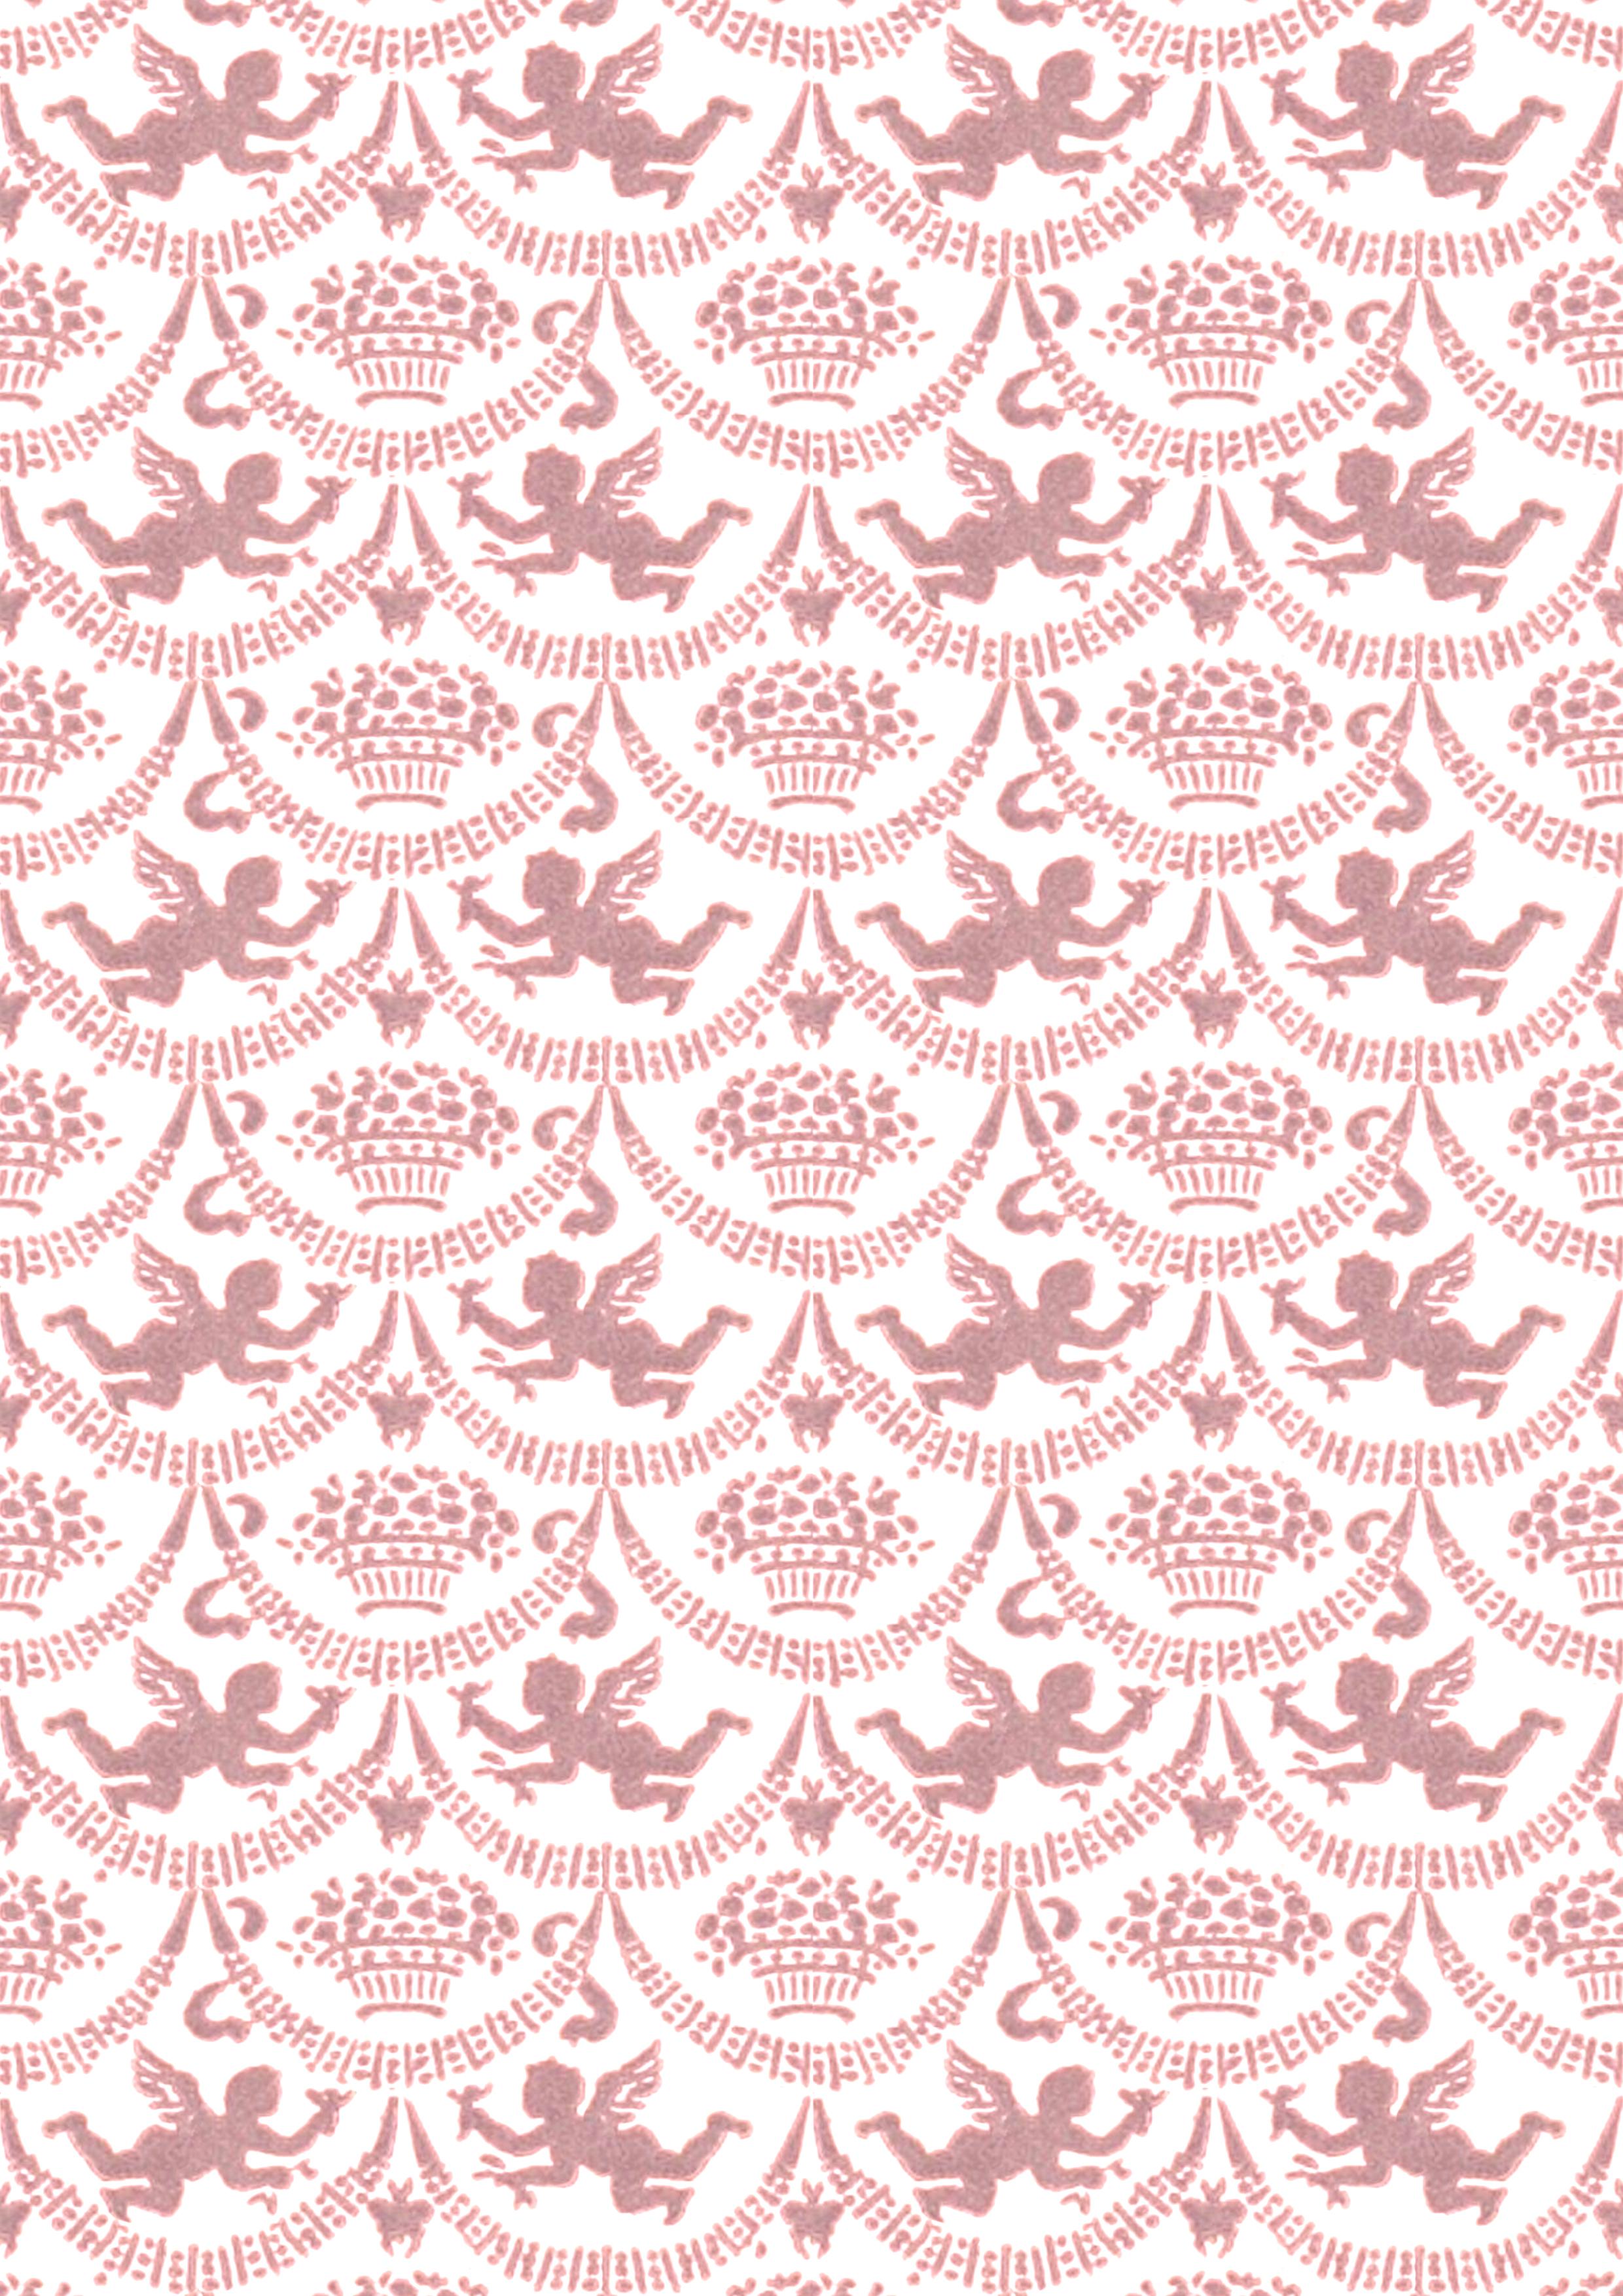 Walter crane cherubs 1900 seamless tile printable for Cute paper designs